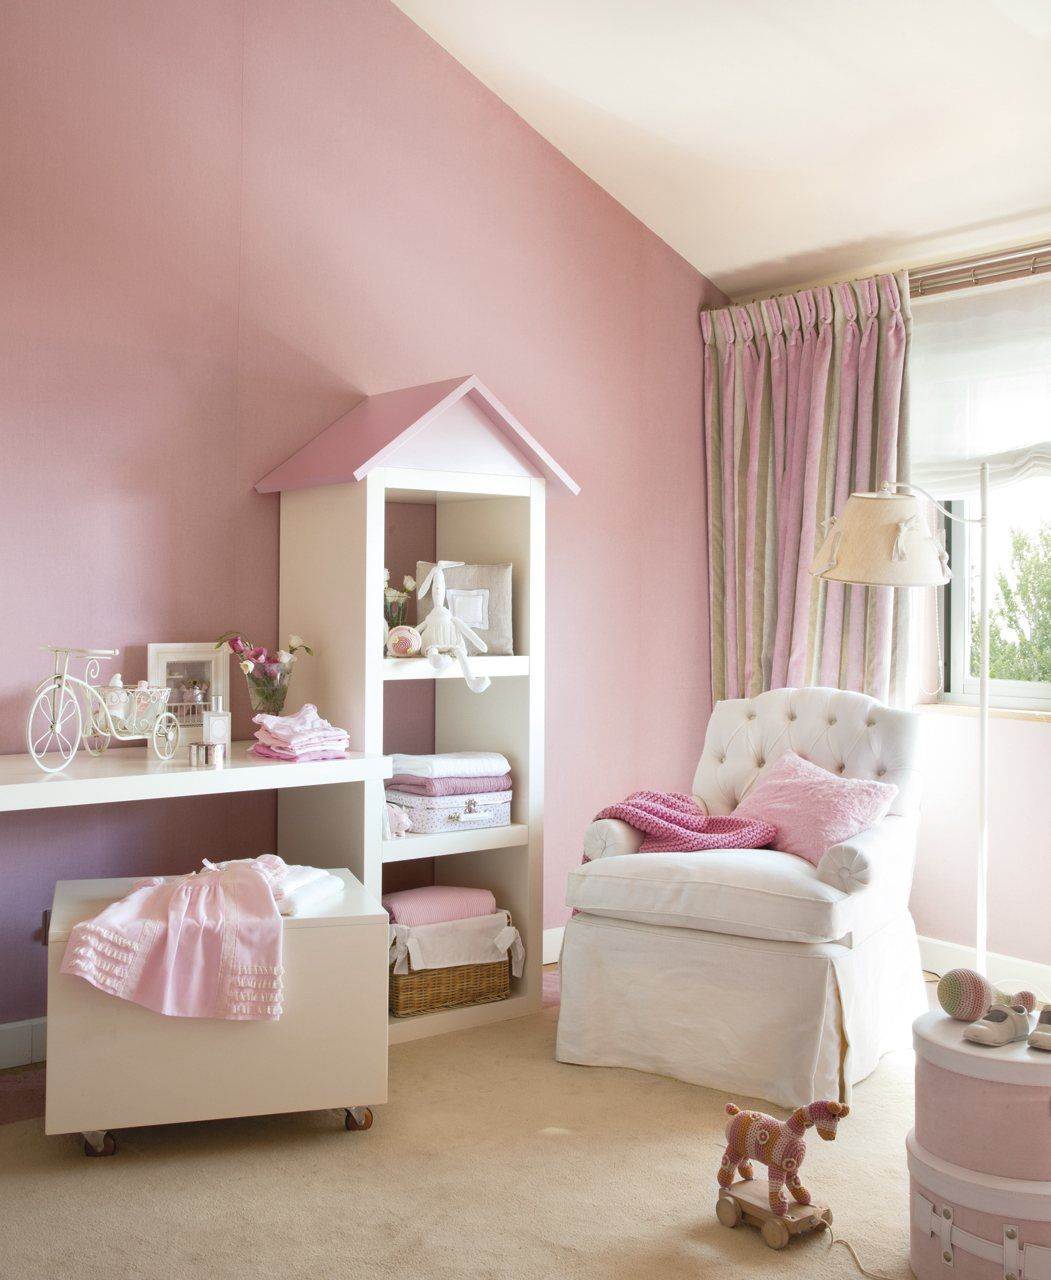 Maxi ideas para mini habitaciones imag - Babymobel berlin ...